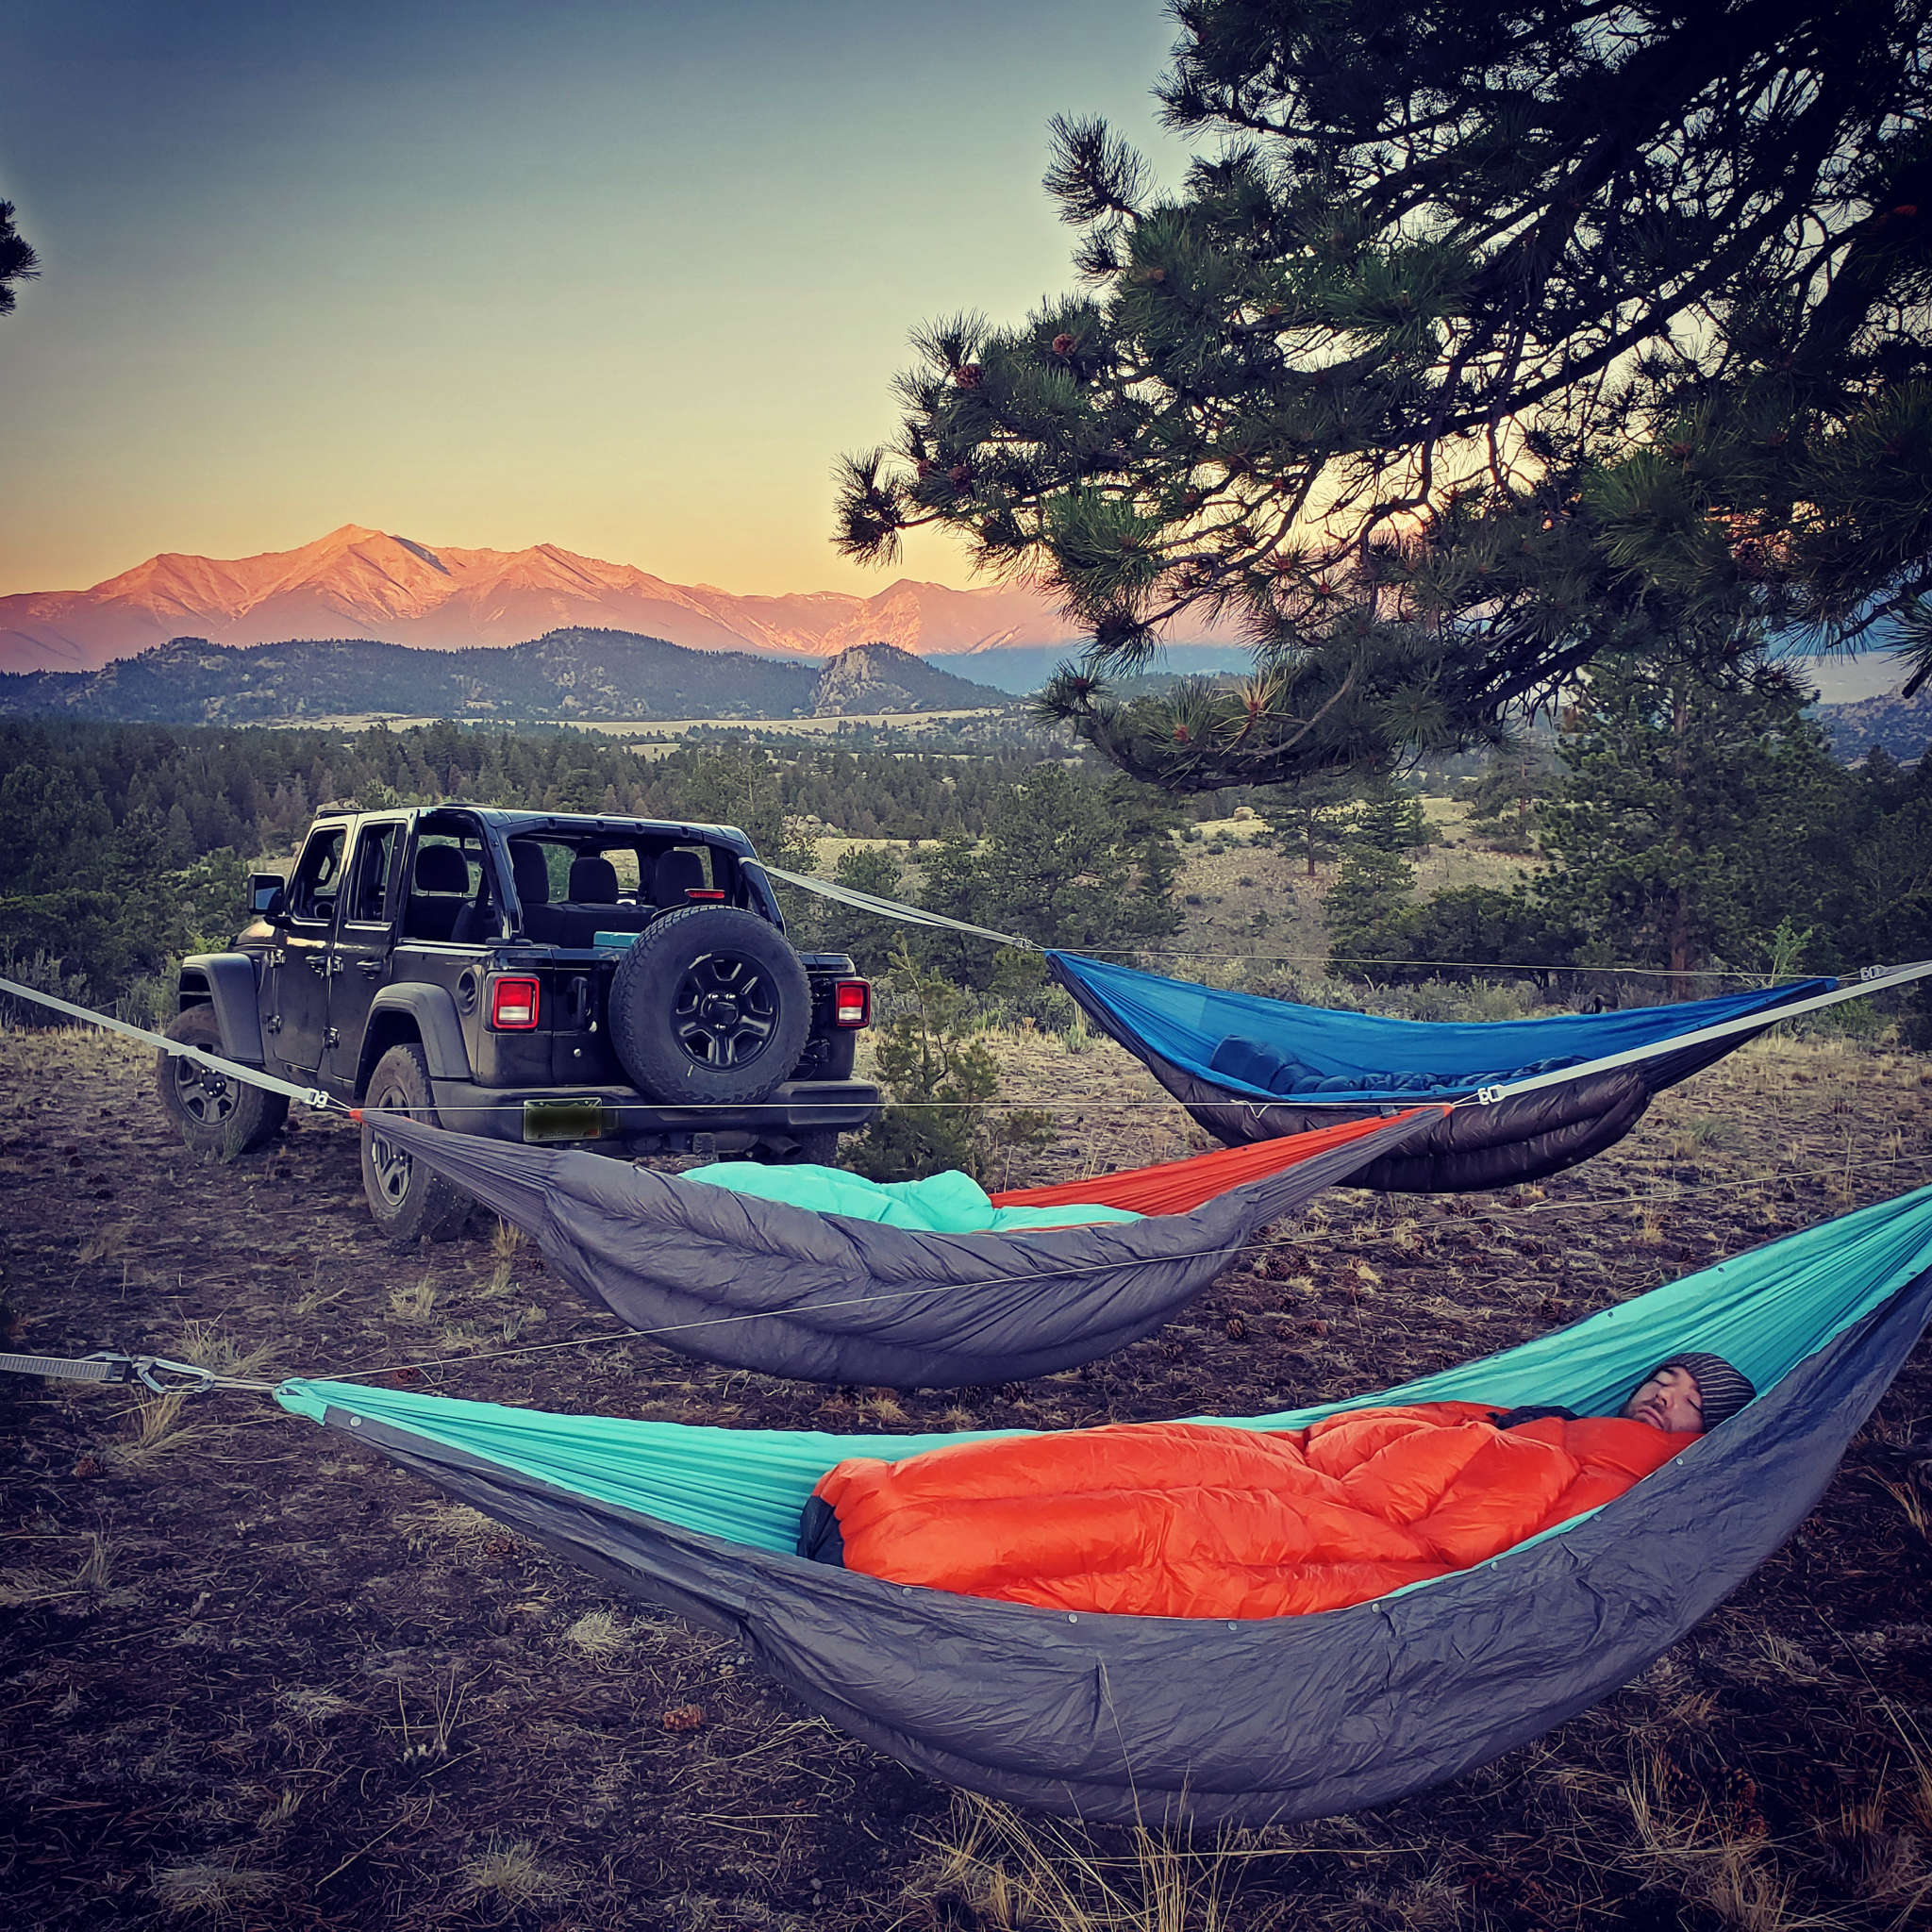 Jeep hammock camping with Superior Hammocks